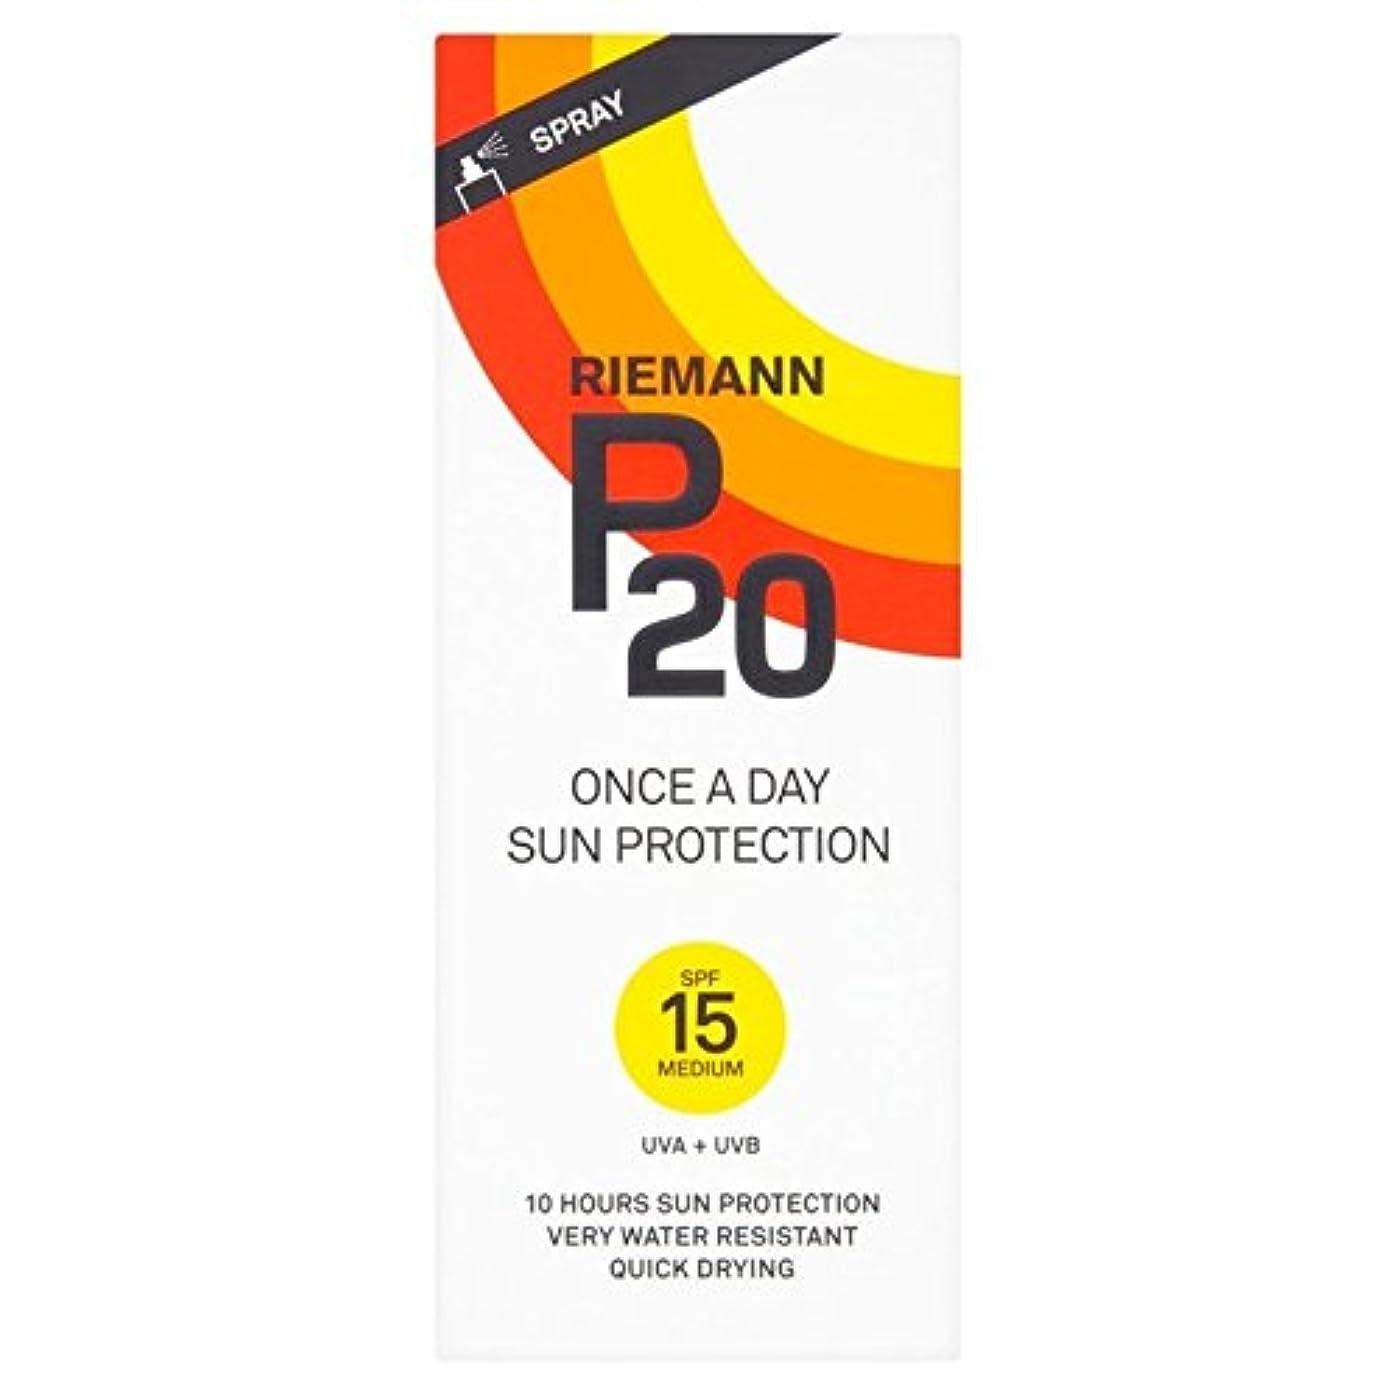 Riemann P20 SPF15 1 Day/10 Hour Protection 200ml - リーマン20 15 1日/ 10時間の保護200ミリリットル [並行輸入品]